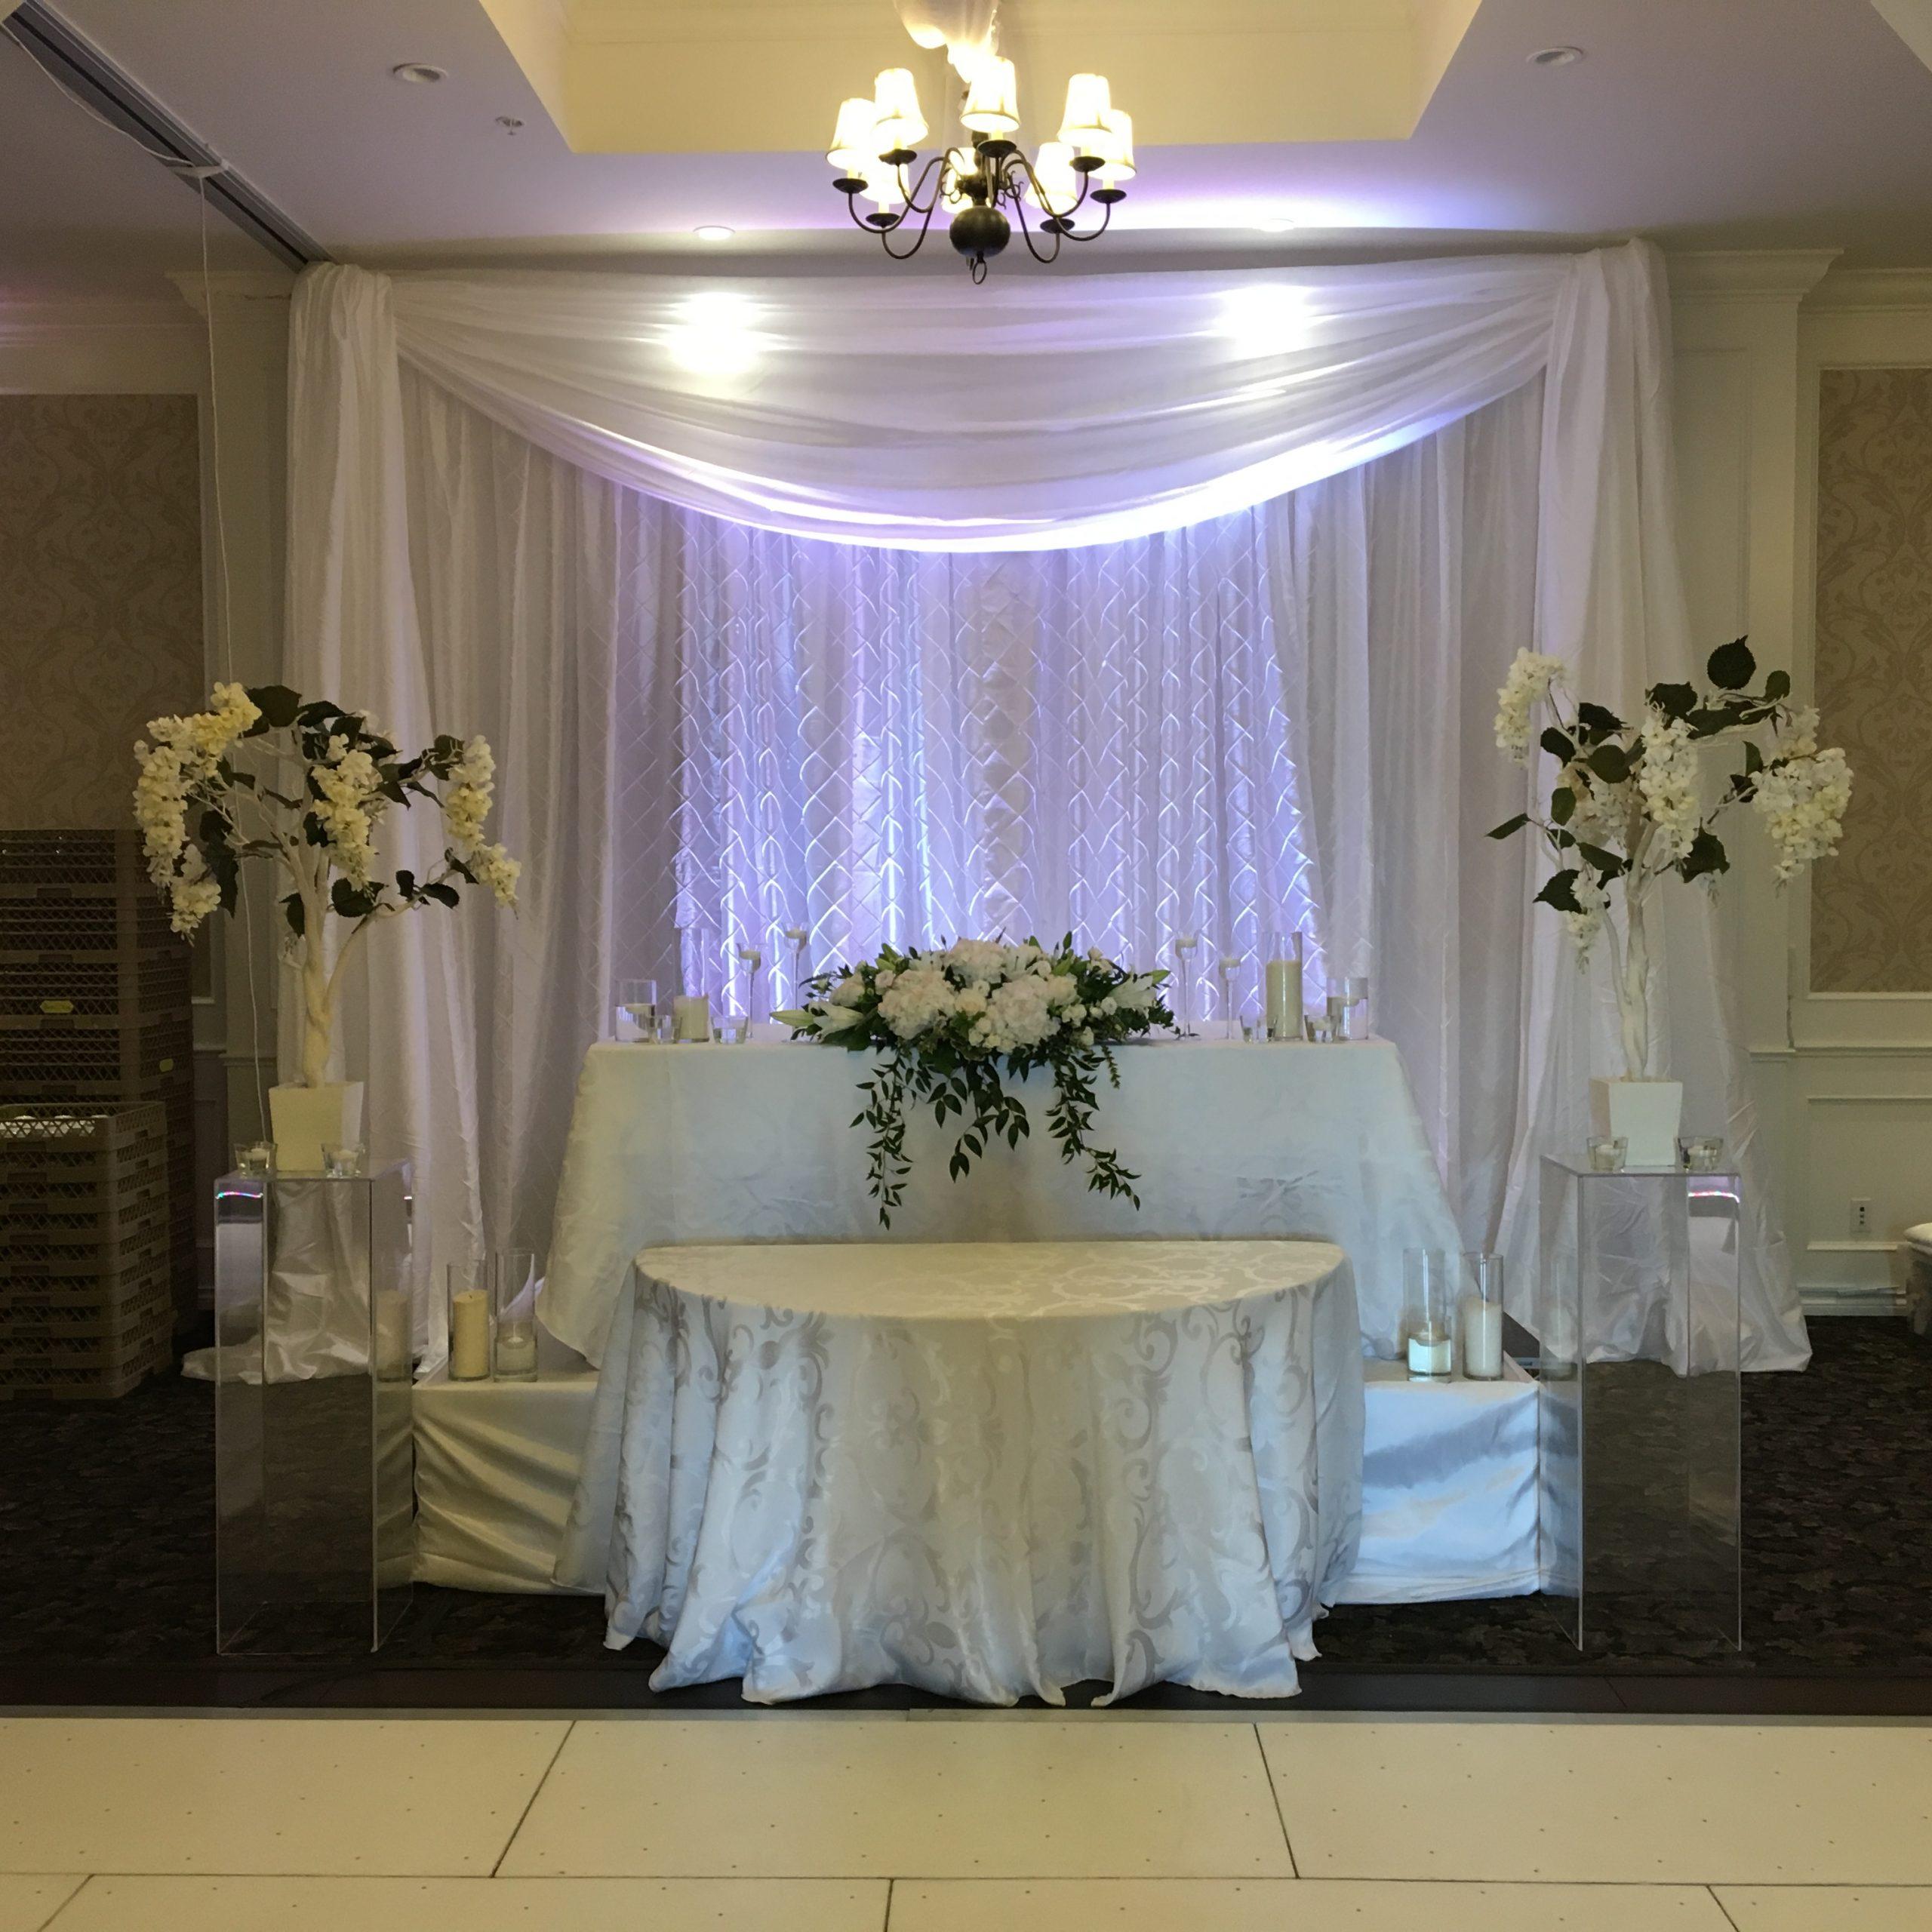 pintuck backdrop by Designer Weddings